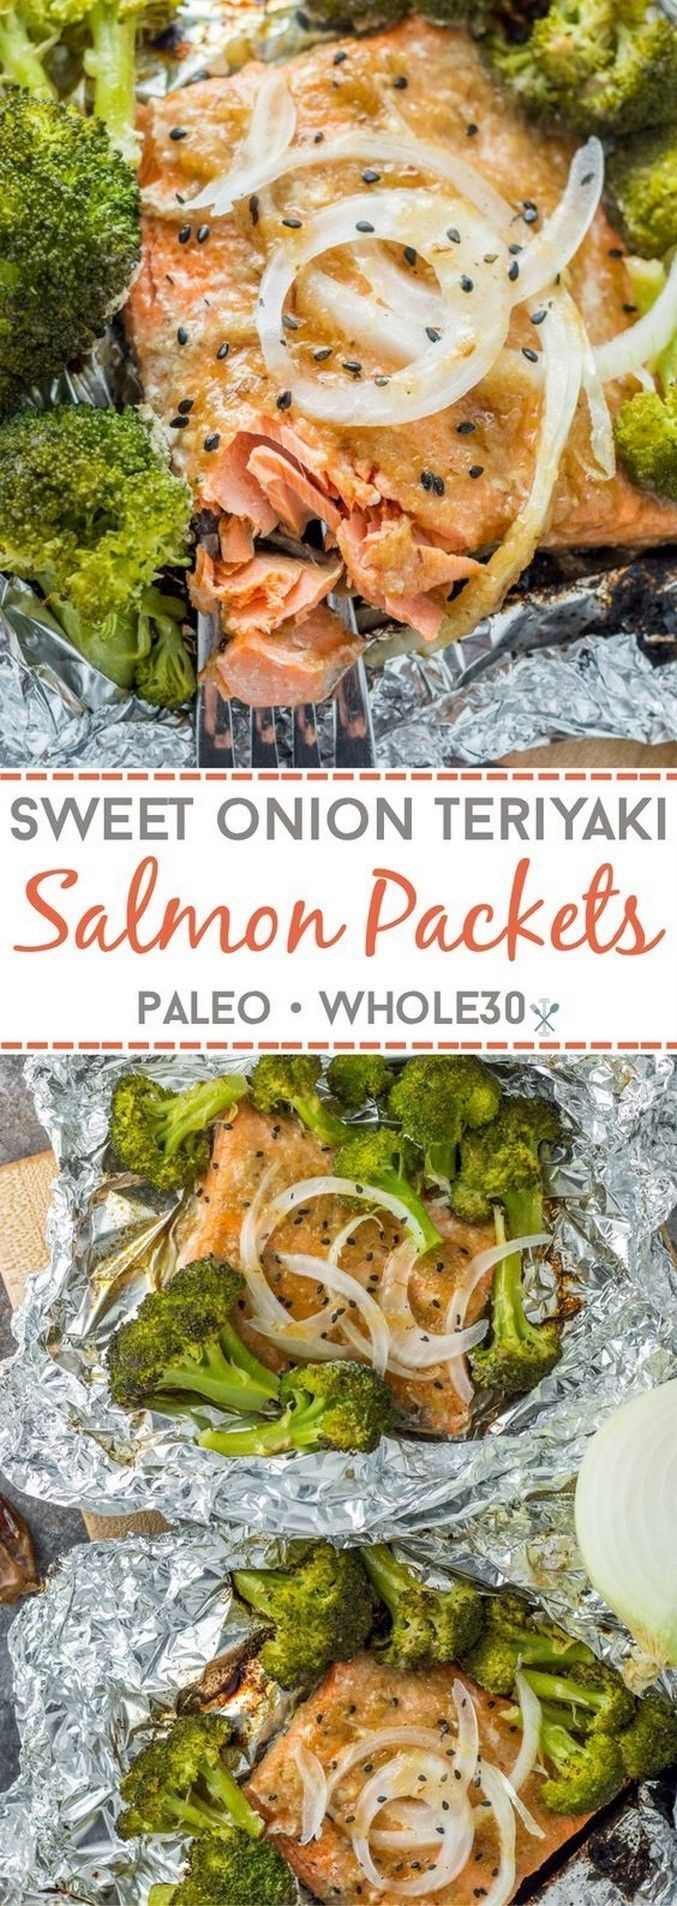 Sweet Onion Teriyaki Salmon Packets (Whole30)   Foil packets #teriyakisalmon Swe...,  #foil #... #teriyakisalmon